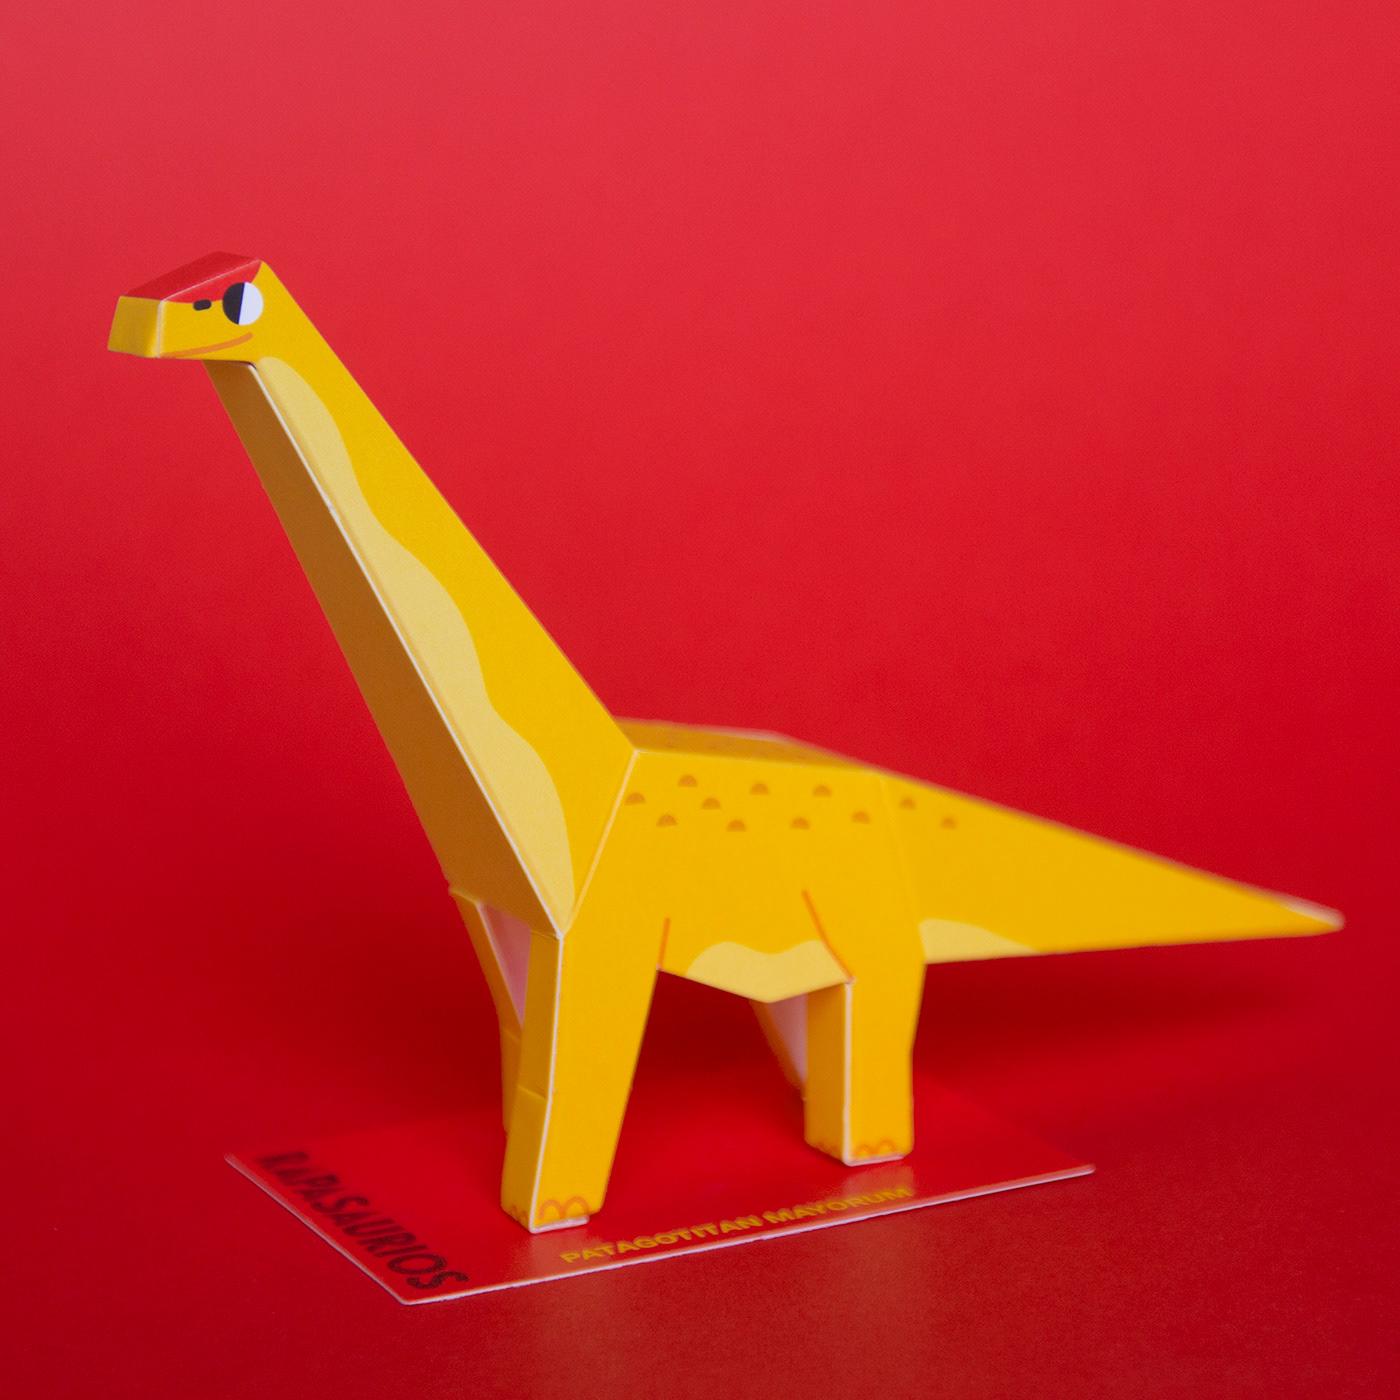 papercraft dinosaurs guardabosques rapanui paper dinosaurs lowpoly paper kit ILLUSTRATION  branding  papertoys